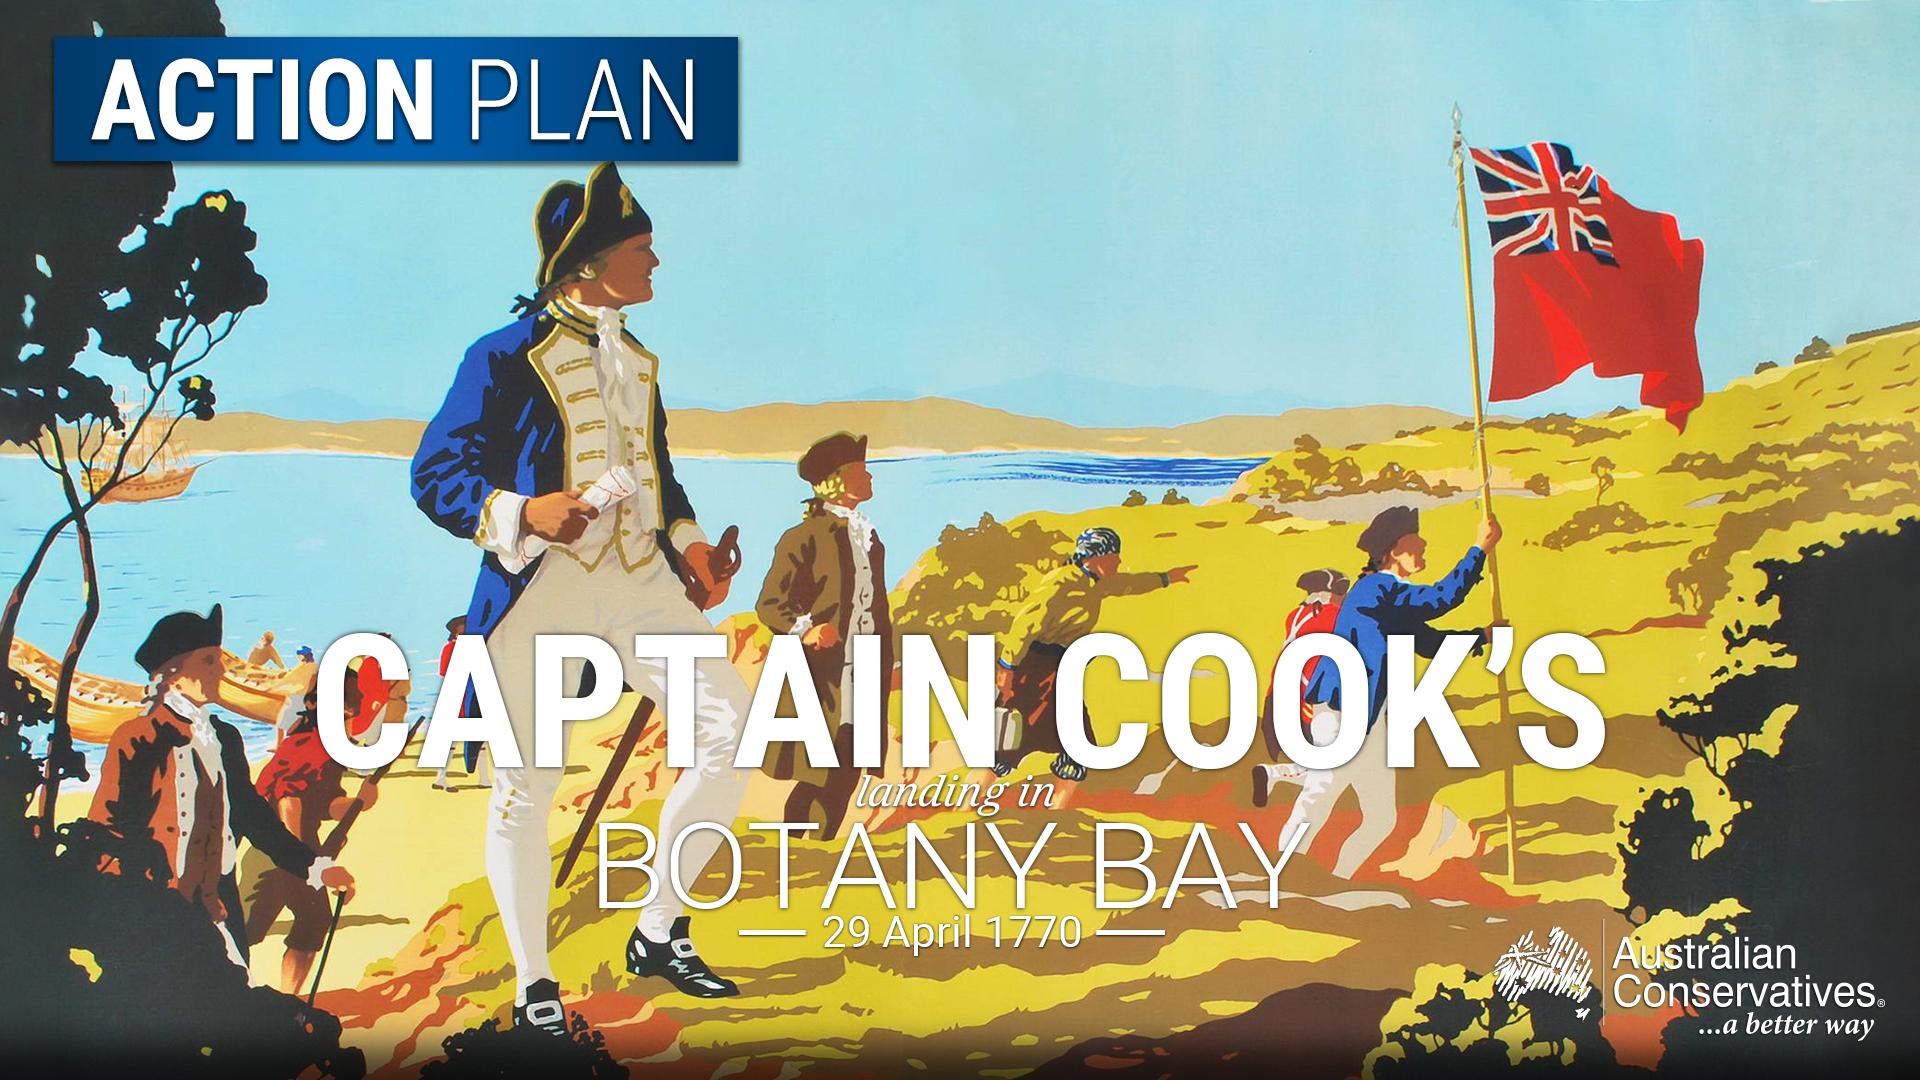 Map Of Australia 1770.Captain Cook S Landing In Botany Bay Australian Conservatives